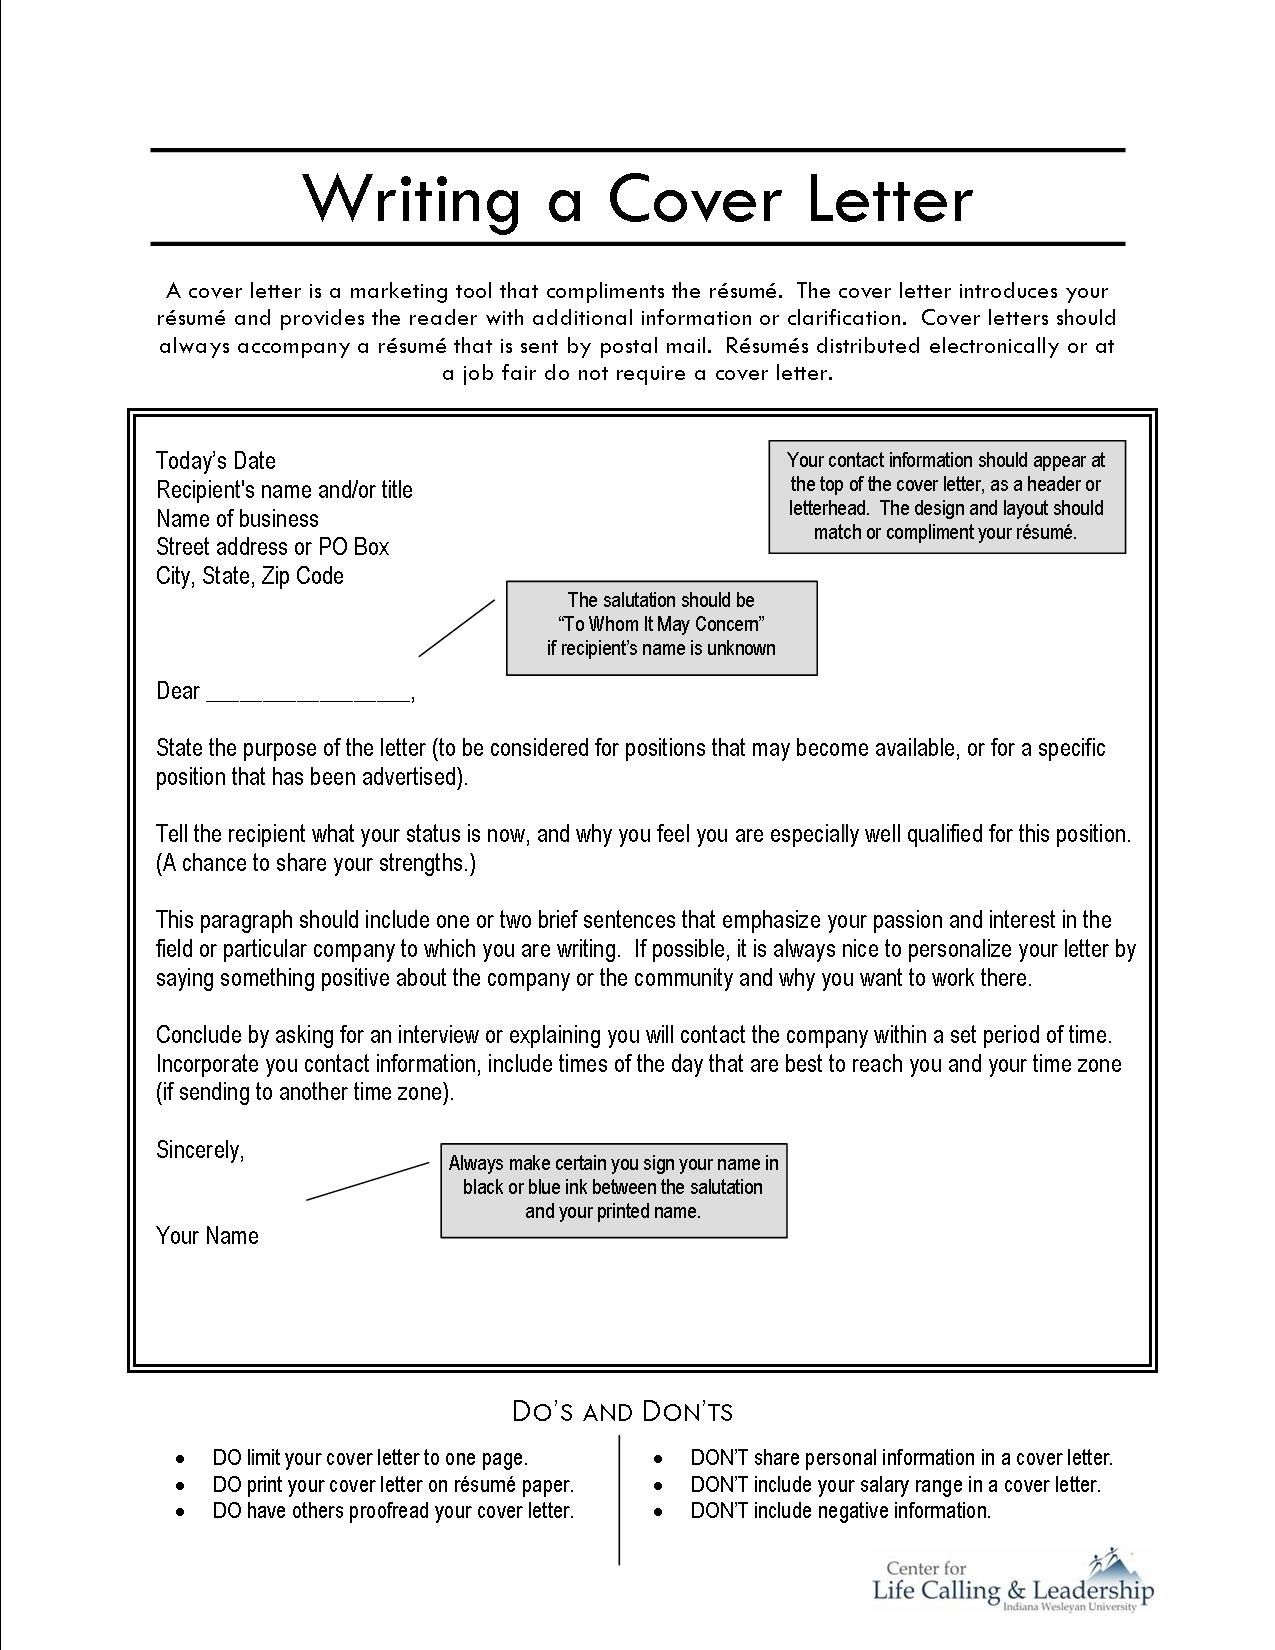 Cover Letter For Postal Service Gallery - Cover Letter Sample